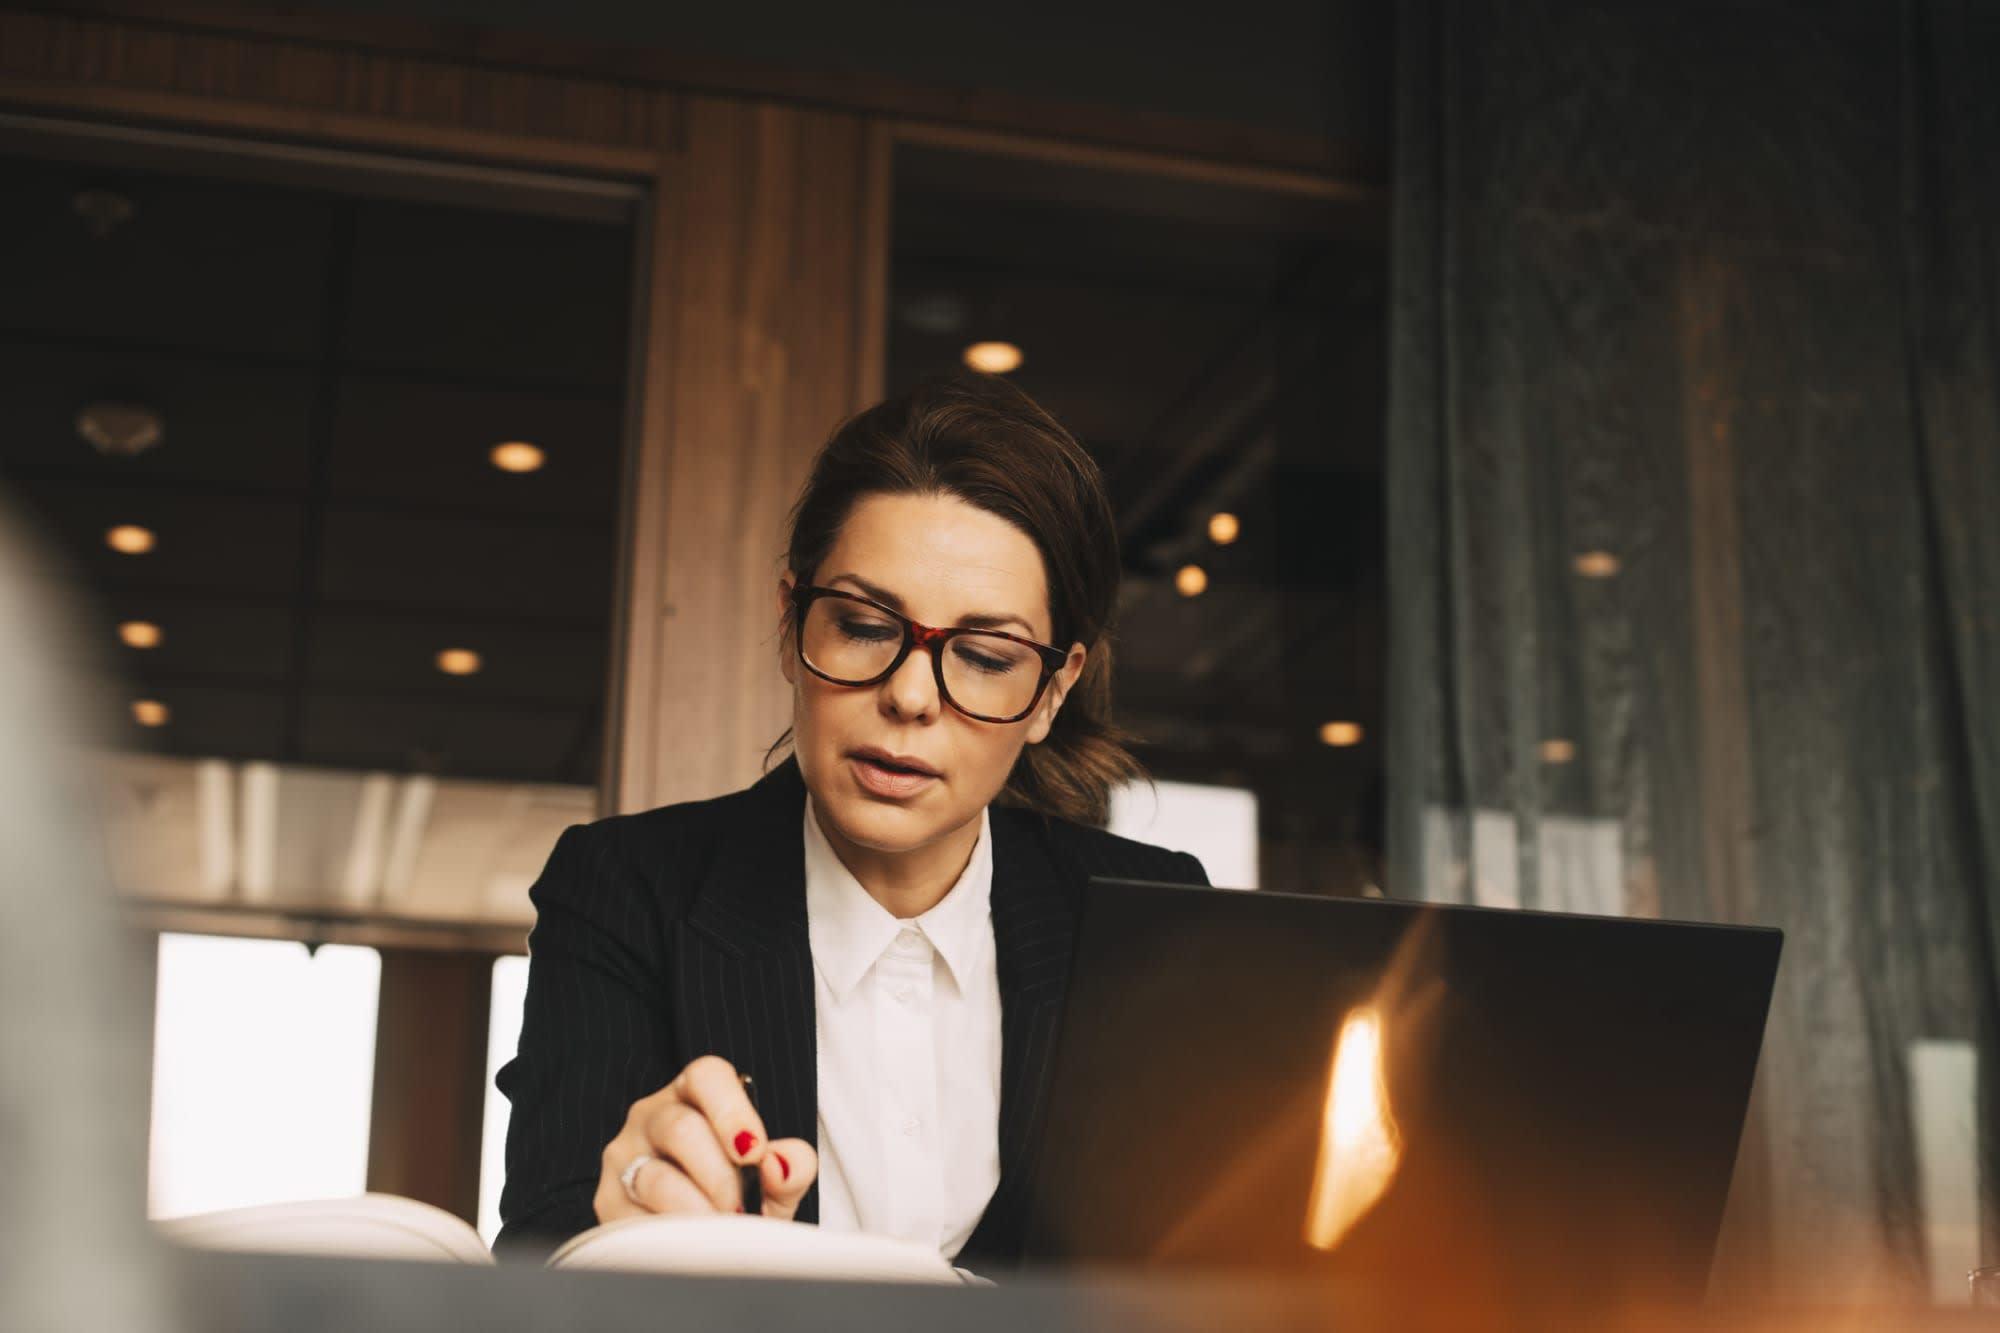 Online Bachelor's in Law Programs 2021